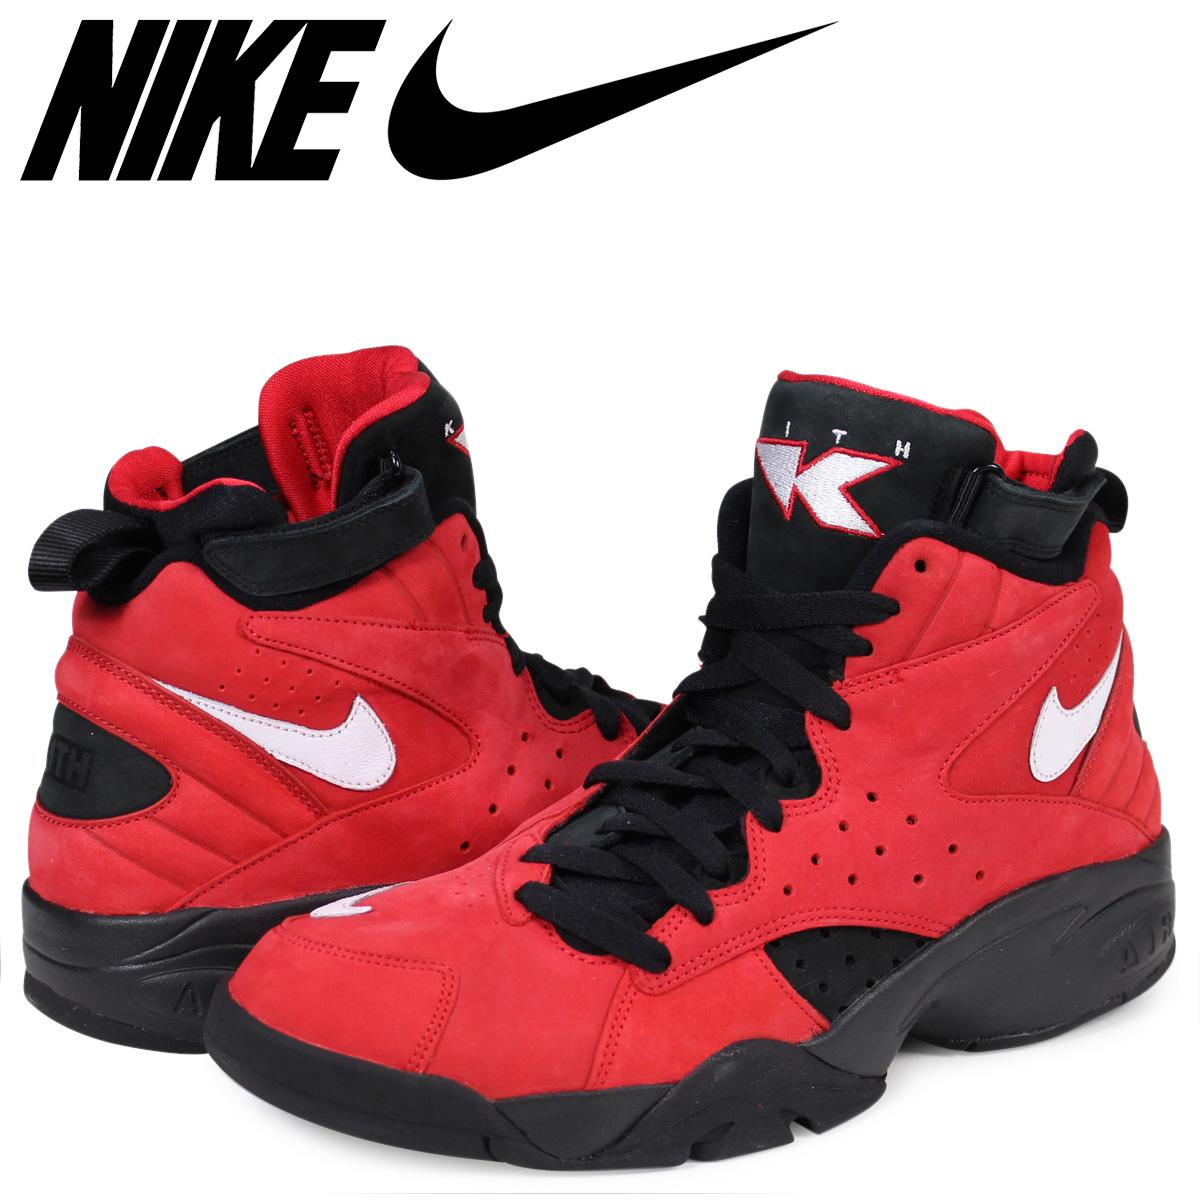 NIKE AIR MAESTRO 2 QS Nike KITH air maestro 2 sneakers NKAH1069-600 men red